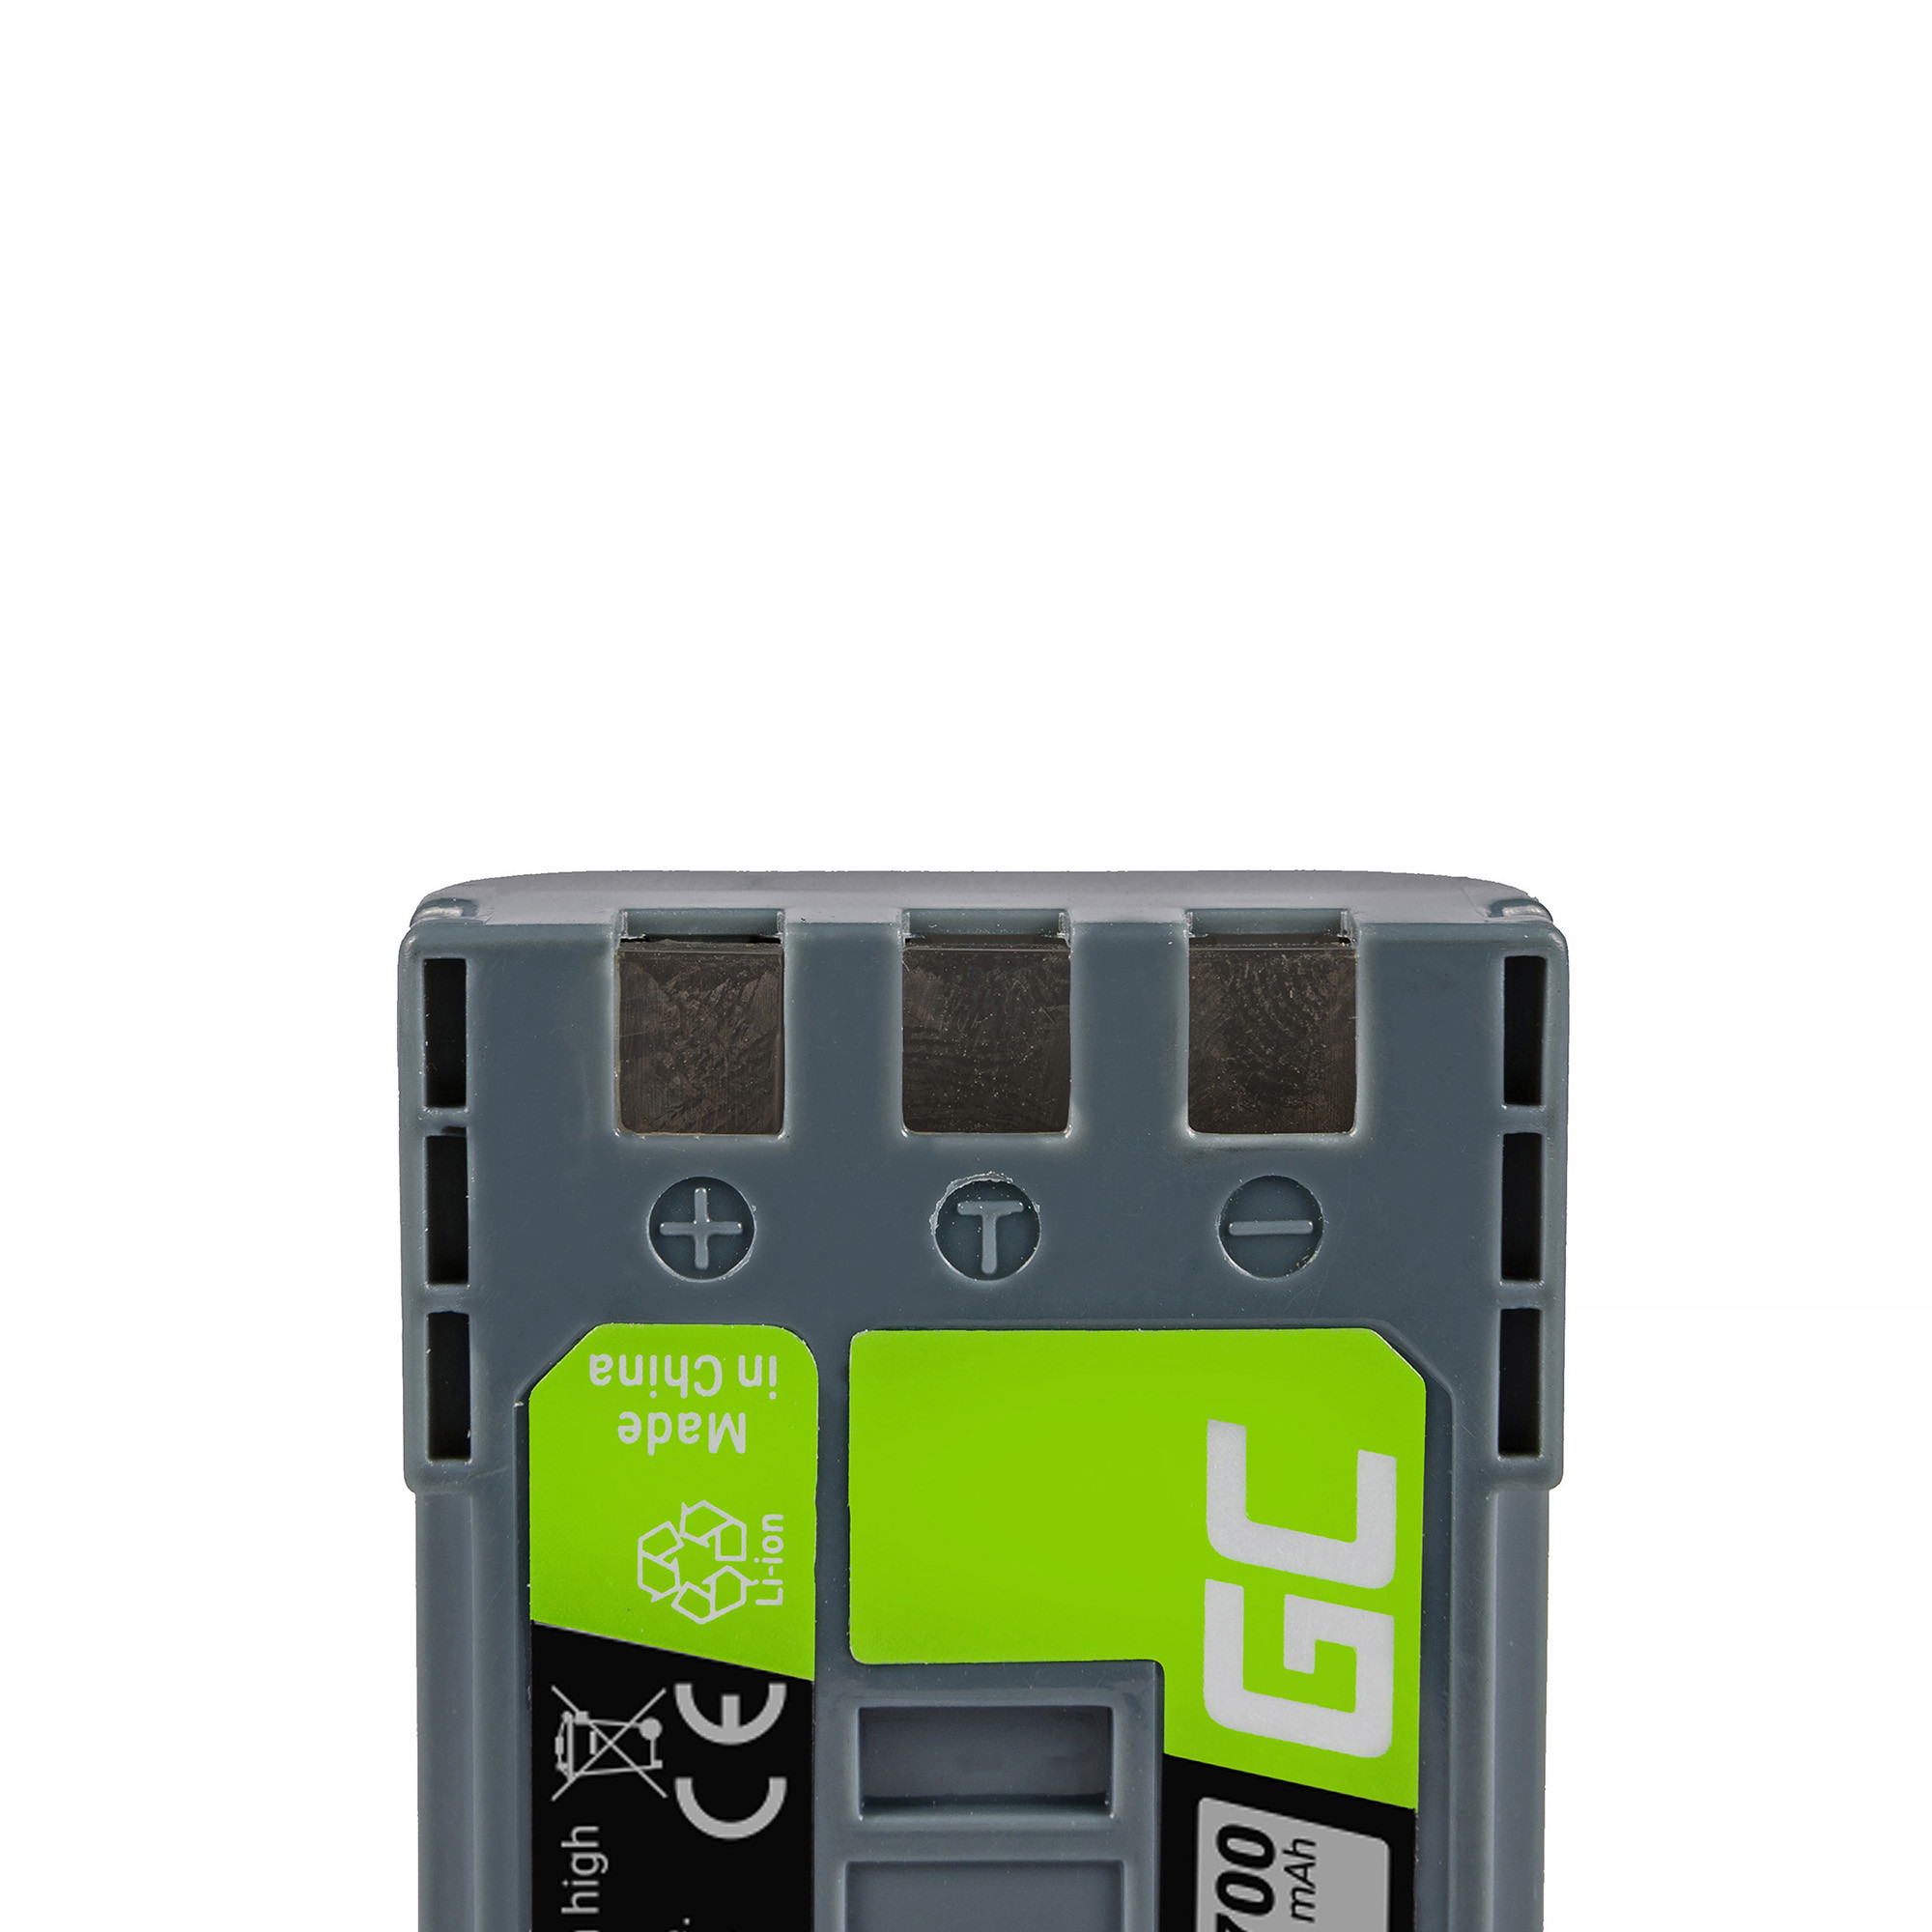 Green Cell Baterie NB-2L / NB-2LH Canon PowerShot G7 G9 S70 S80 R100 R11 Canon Elura 85 90 EOS 350D 400D 7.4V 700mAh